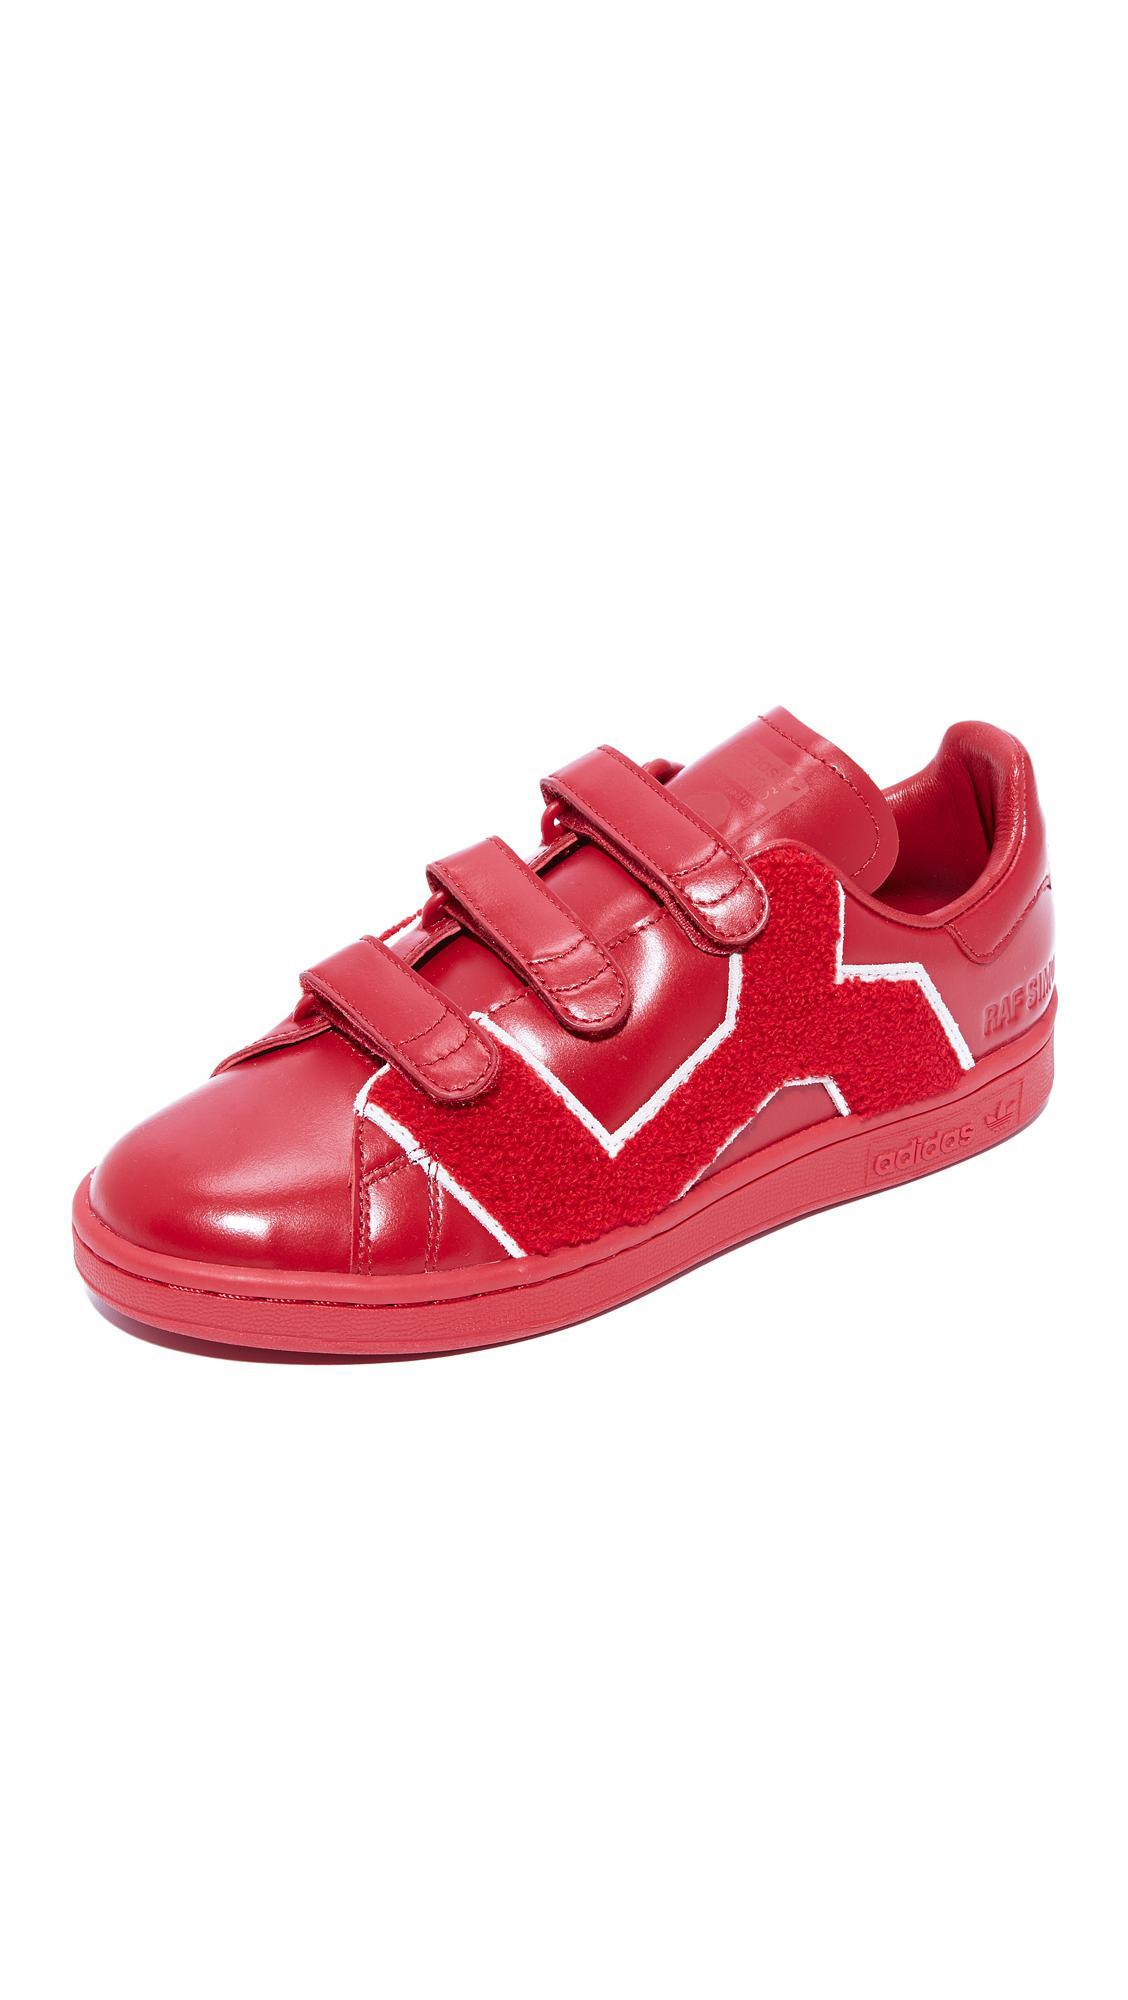 Lyst Adidas Raf Simons Stan Smith Conforto Distintivo Scarpe In Rosso